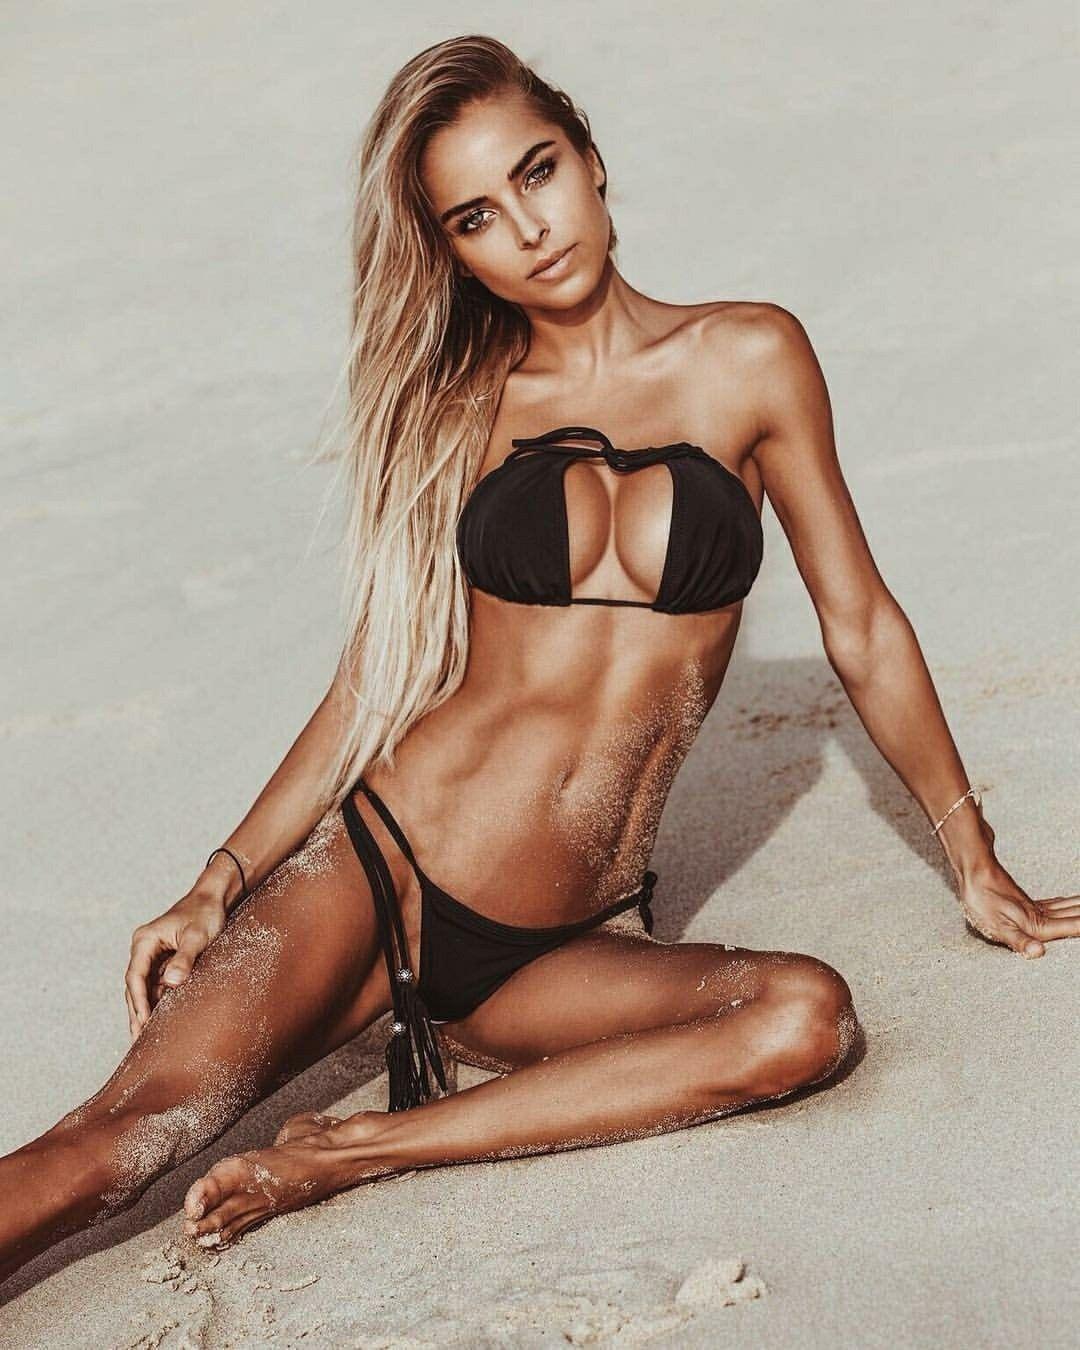 ICloud Chiara Bransi nude (95 foto and video), Tits, Paparazzi, Boobs, legs 2015